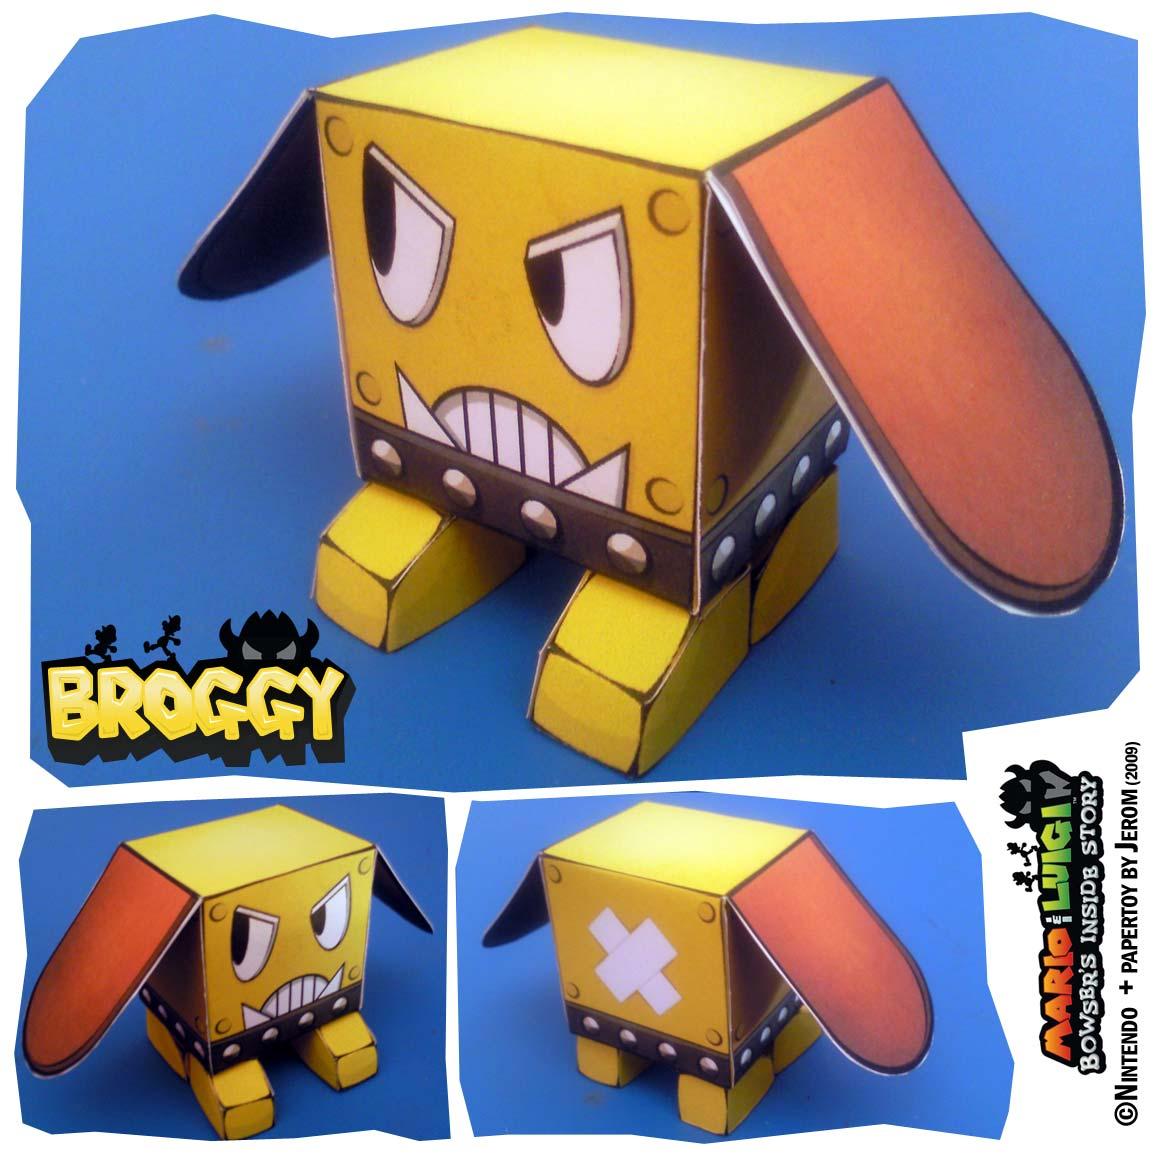 Broggy